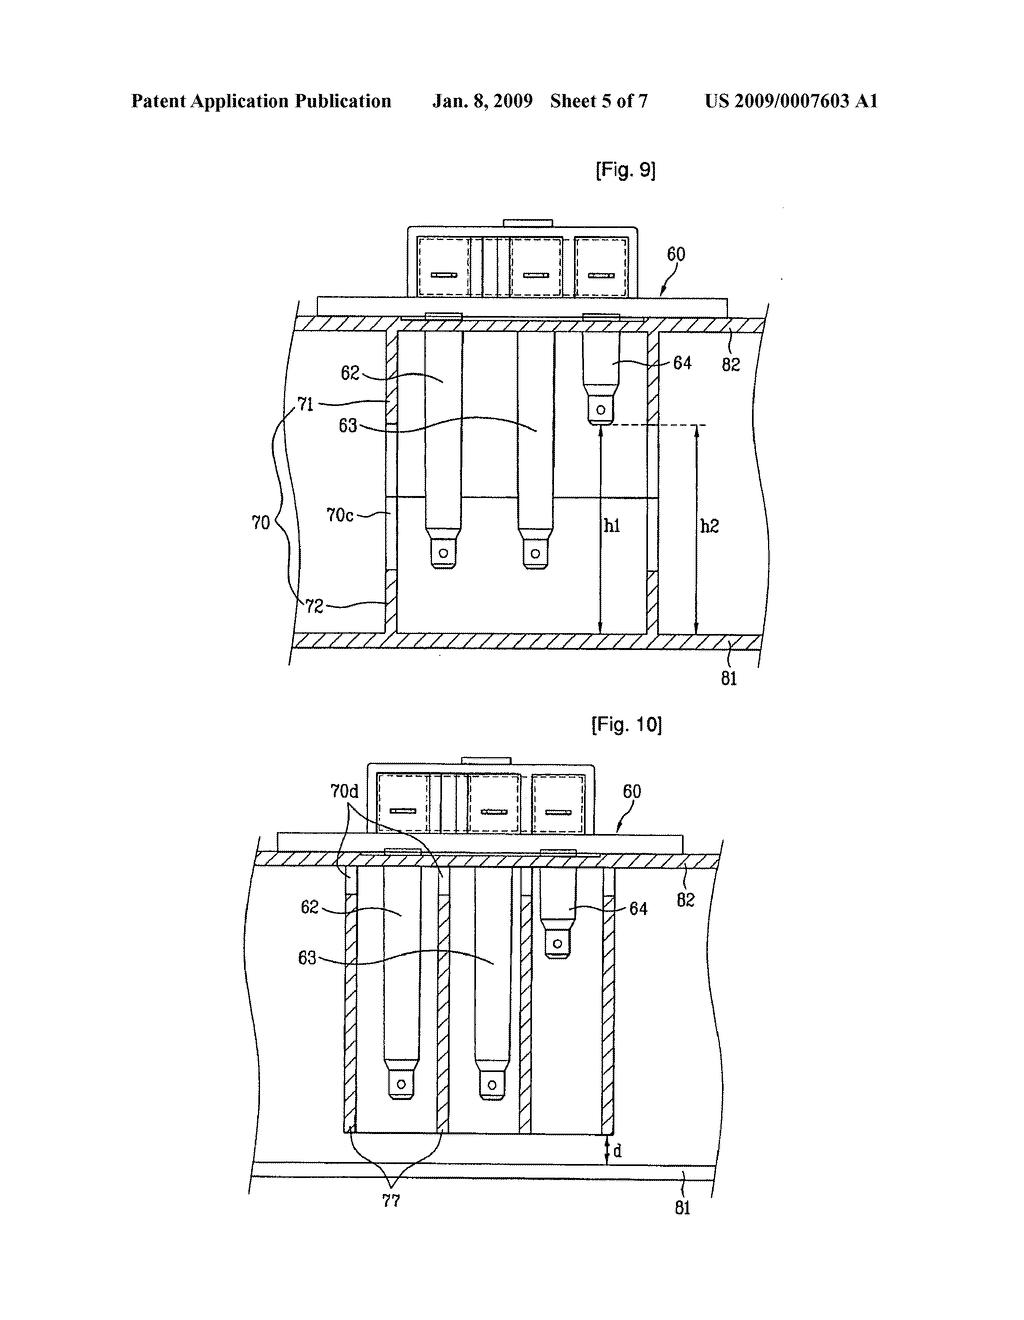 Washing Machine Wiring Diagram Datasheet And Schematics Panasonic Pdf Custom Source Page 5 Structure Of Water Level Sensor For Steam